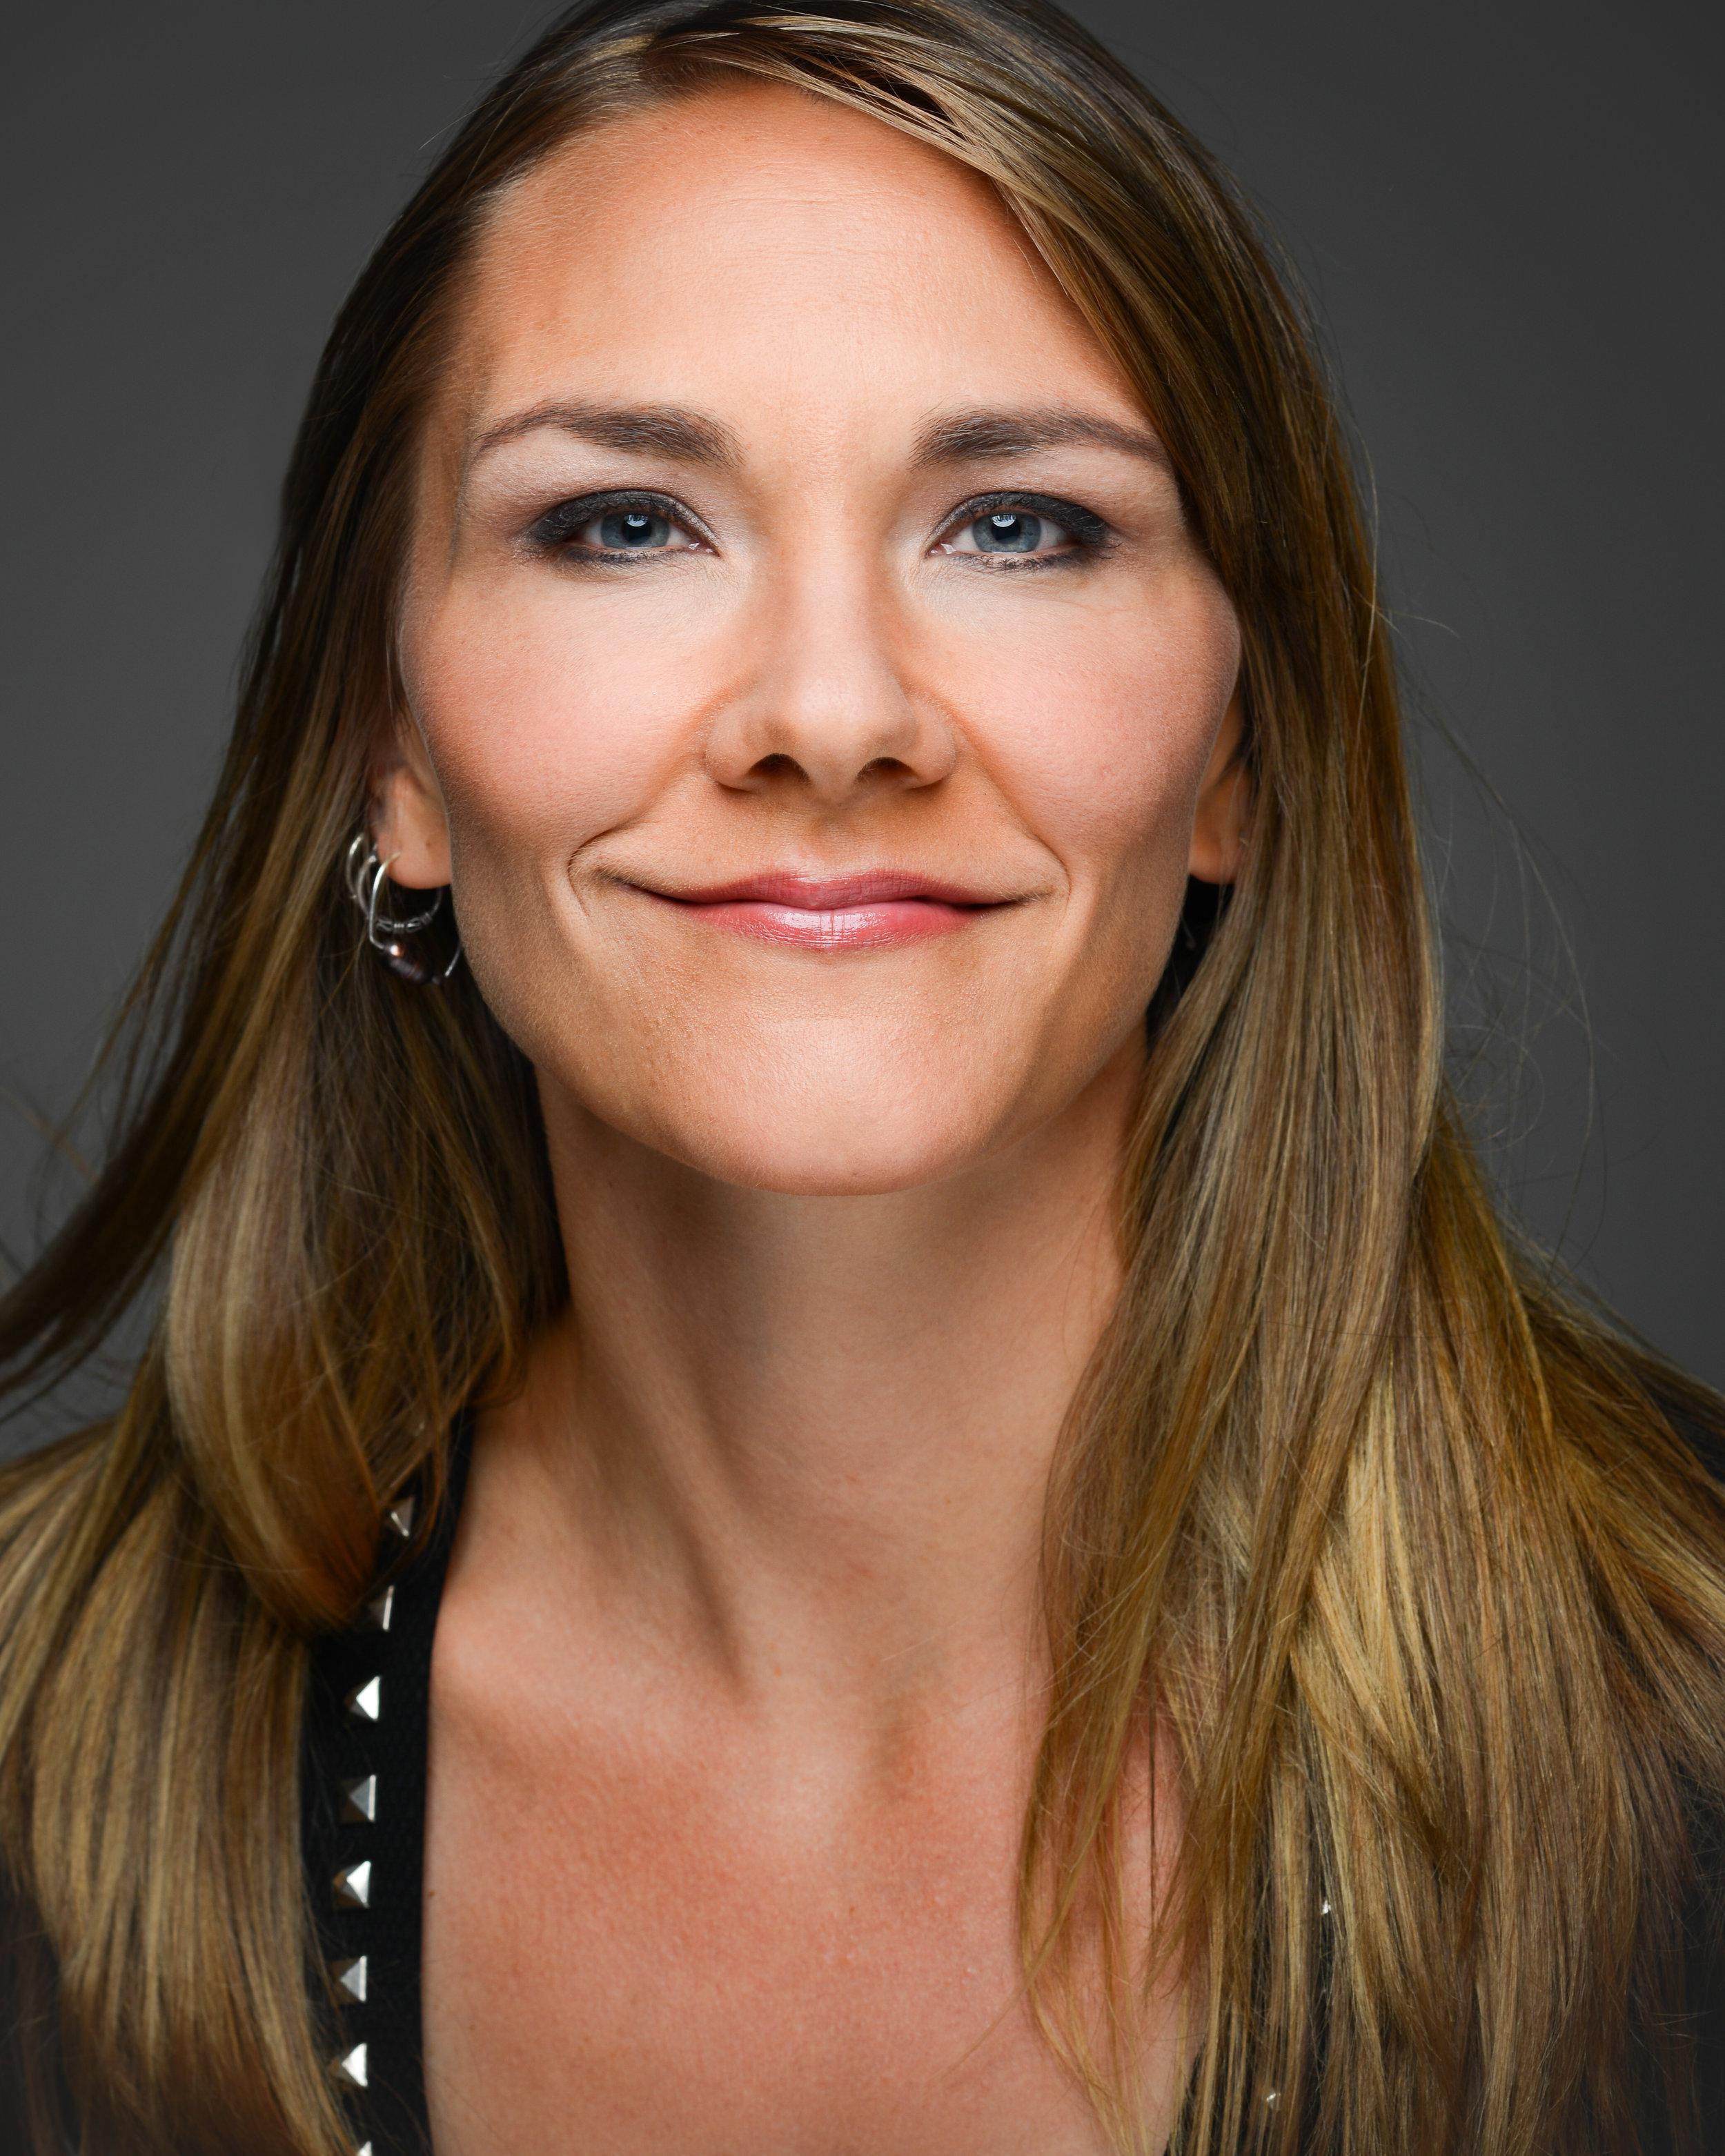 Silvie Jensen, mezzo soprano